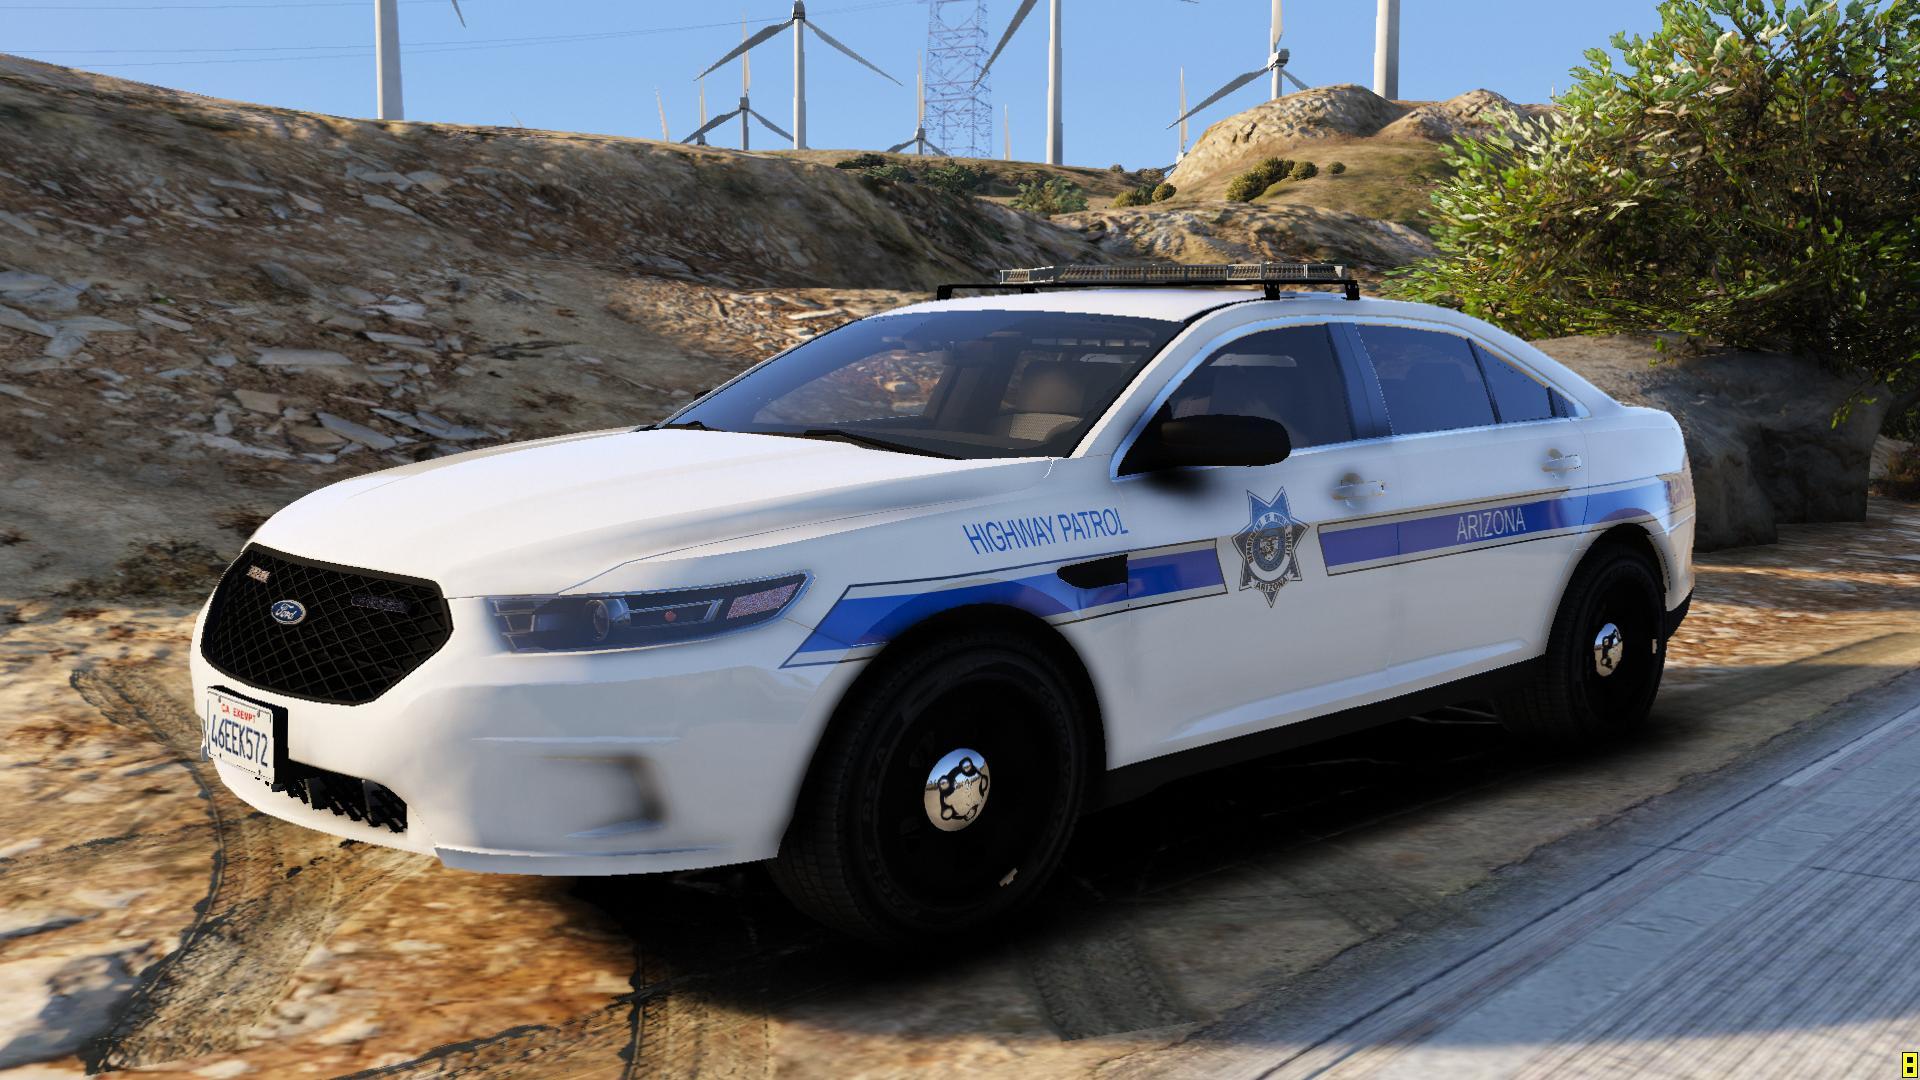 Arizona DPS Highway Patrol 2016 FPIS  GTA5Modscom